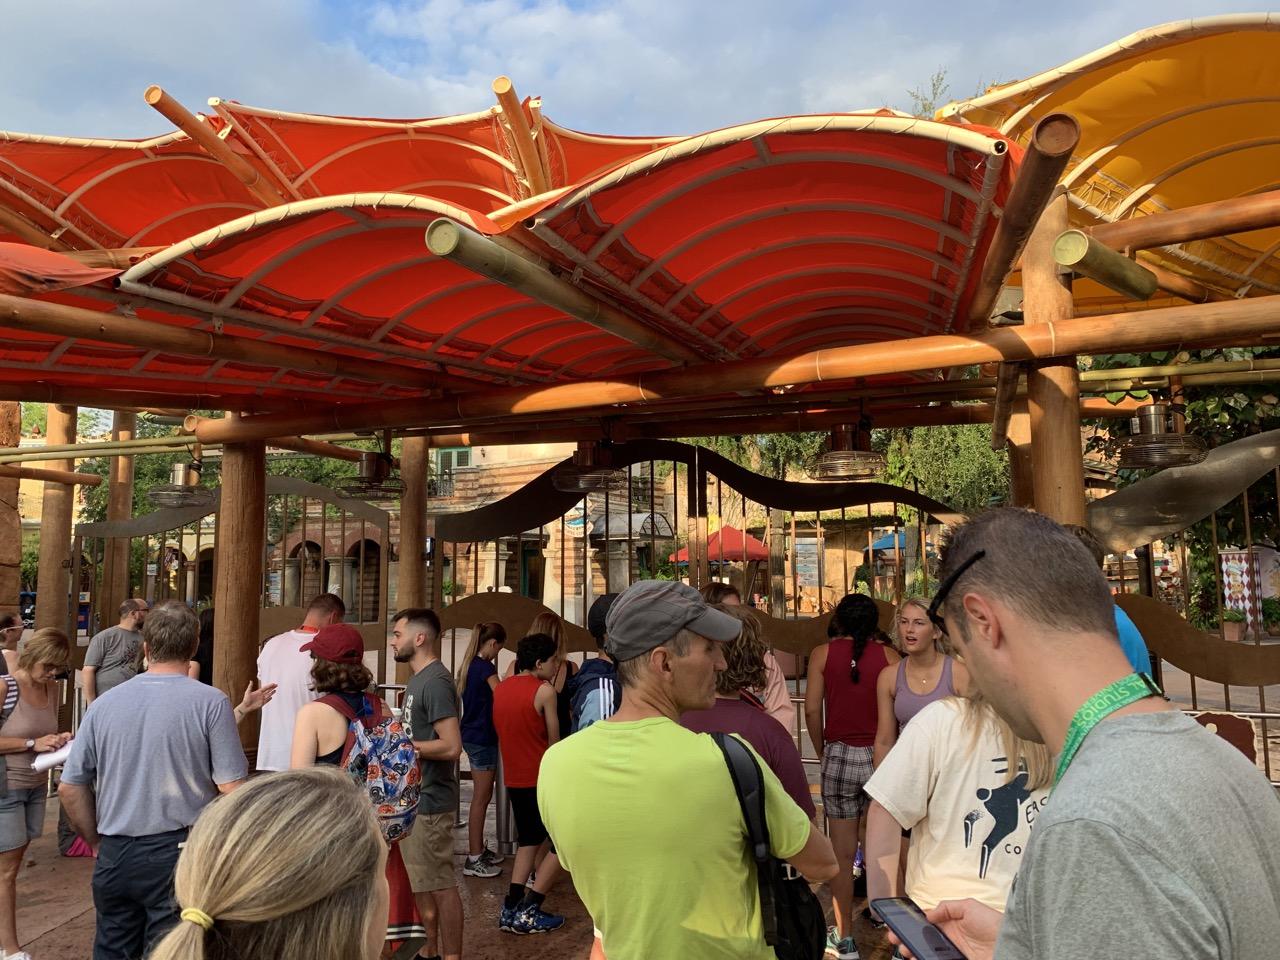 universal orlando summer 2019 trip report part 4 turnstiles 1.jpeg